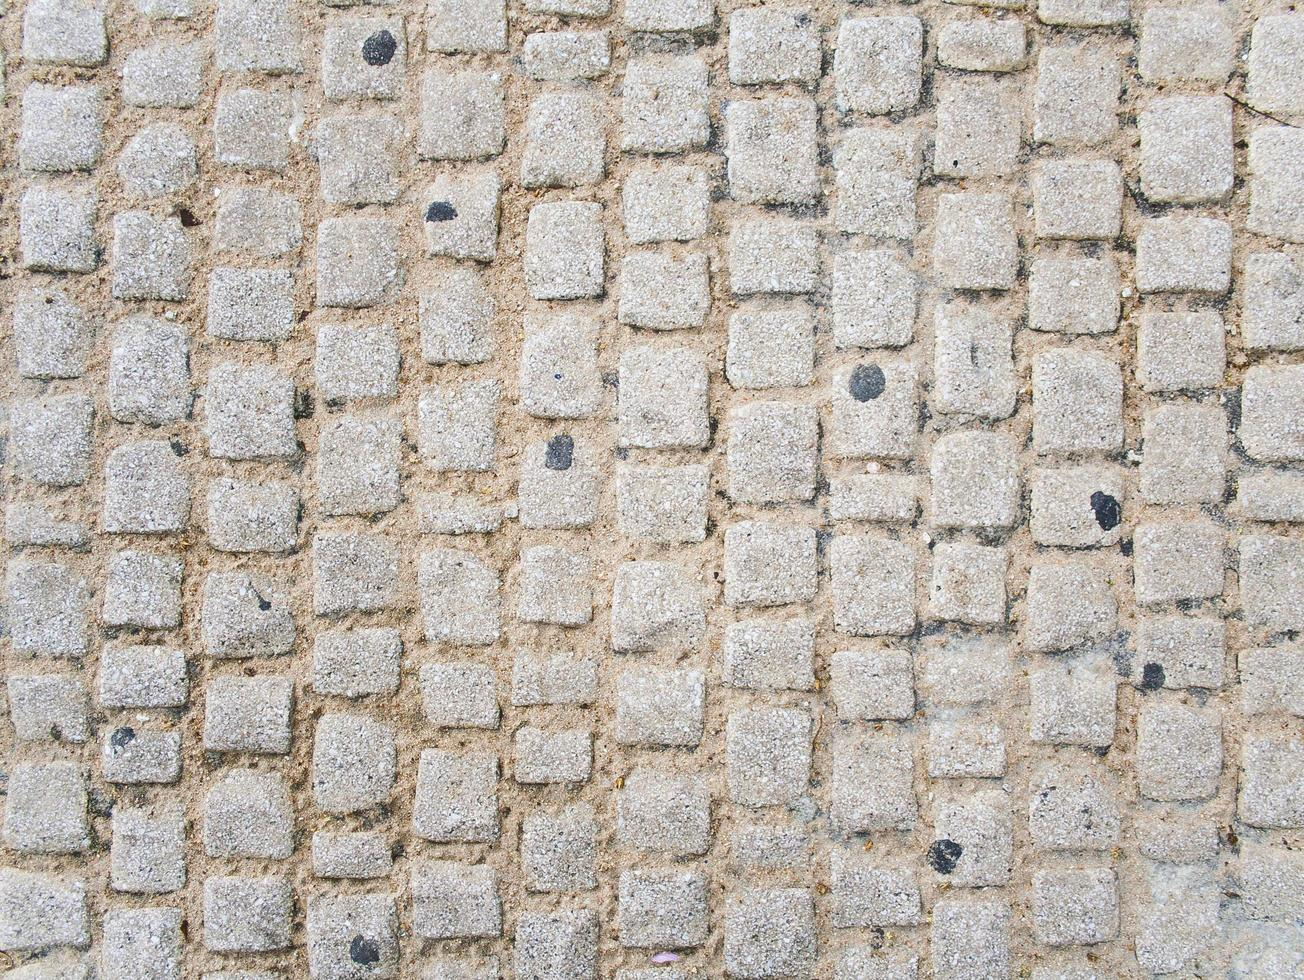 Pattern of cobblestone sidewalk photo